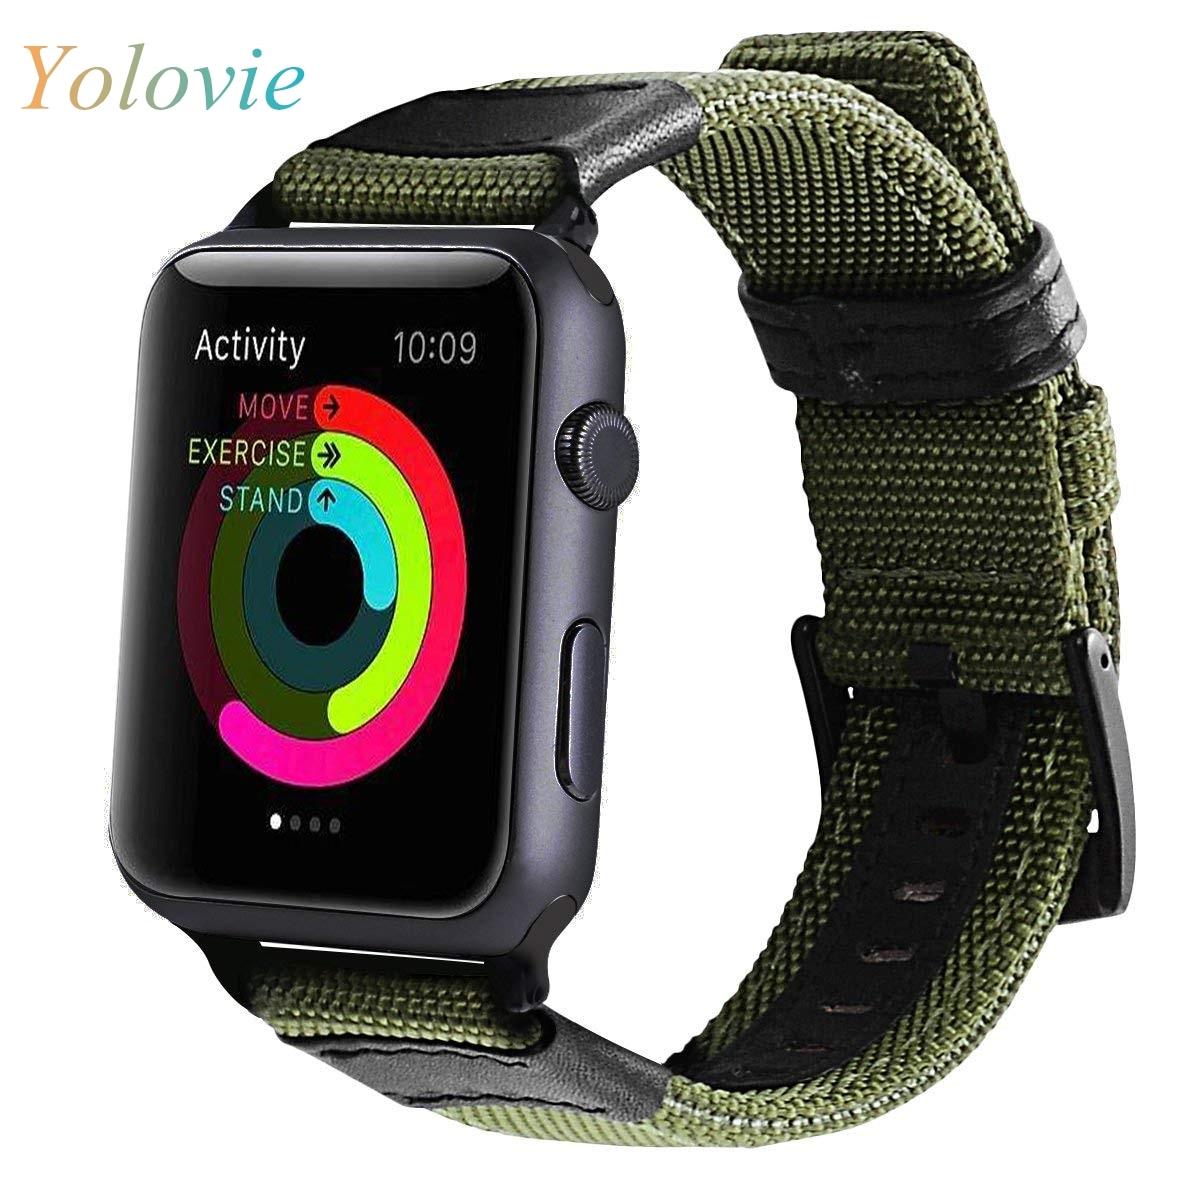 Yolovie Nylon Leather Watch Band For Apple Watch 38/42mm 40/44mm. Nylon NATO Watch Band For Iwatch Series 5 4 3 2 1